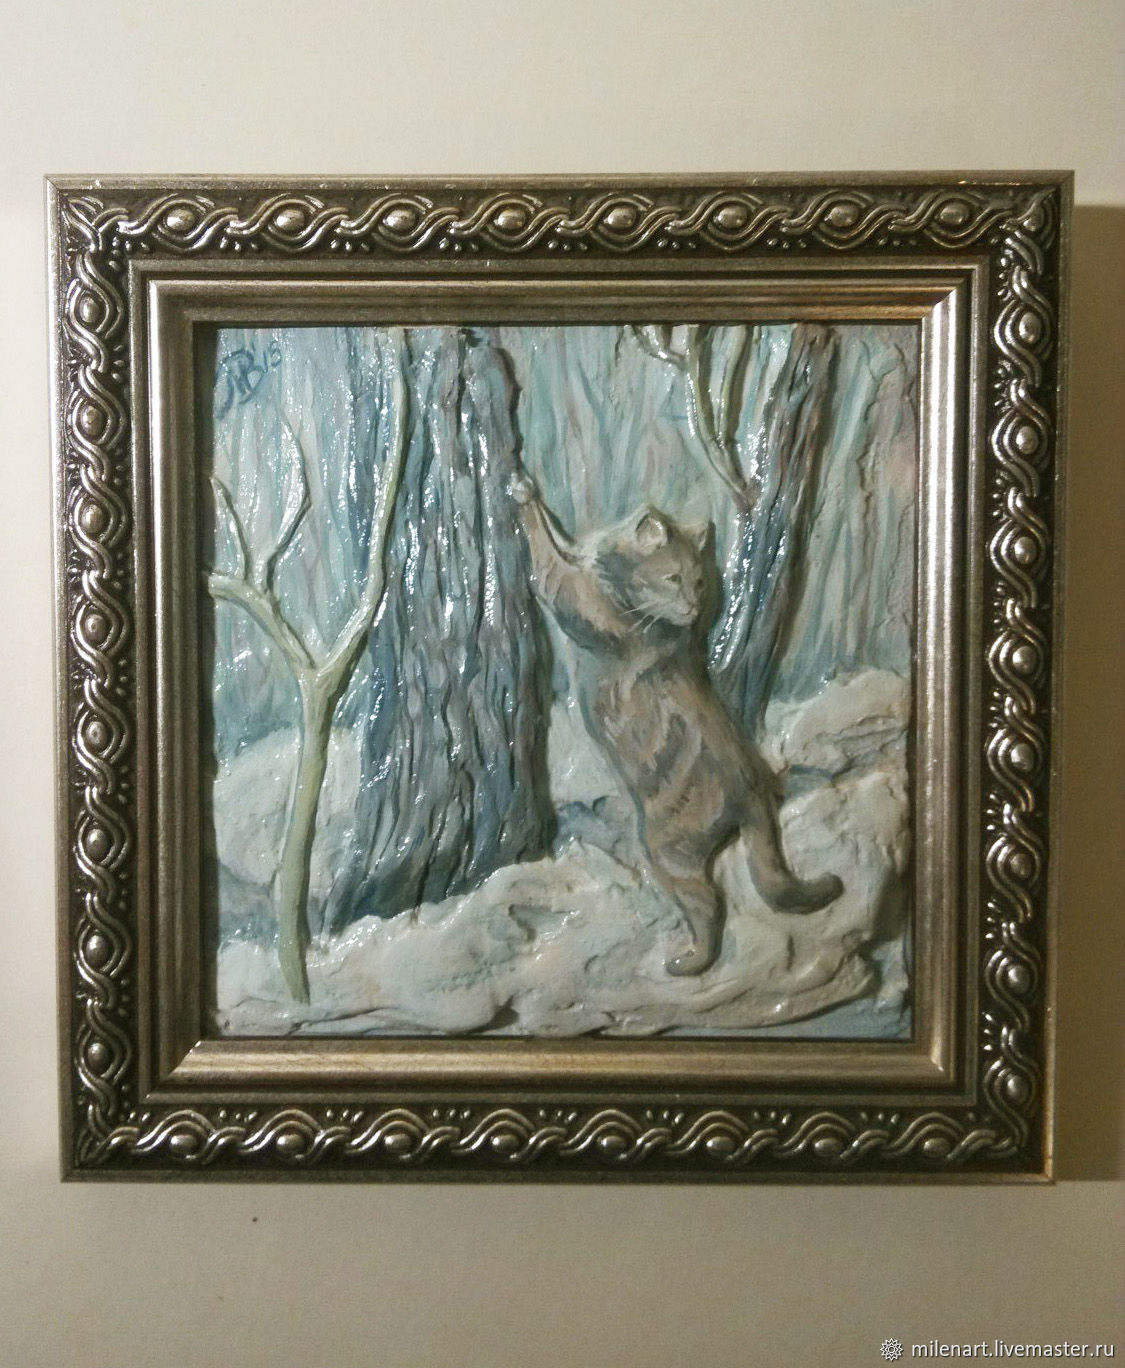 "Барельеф ""Кот в лесу"", Картины, Санкт-Петербург,  Фото №1"